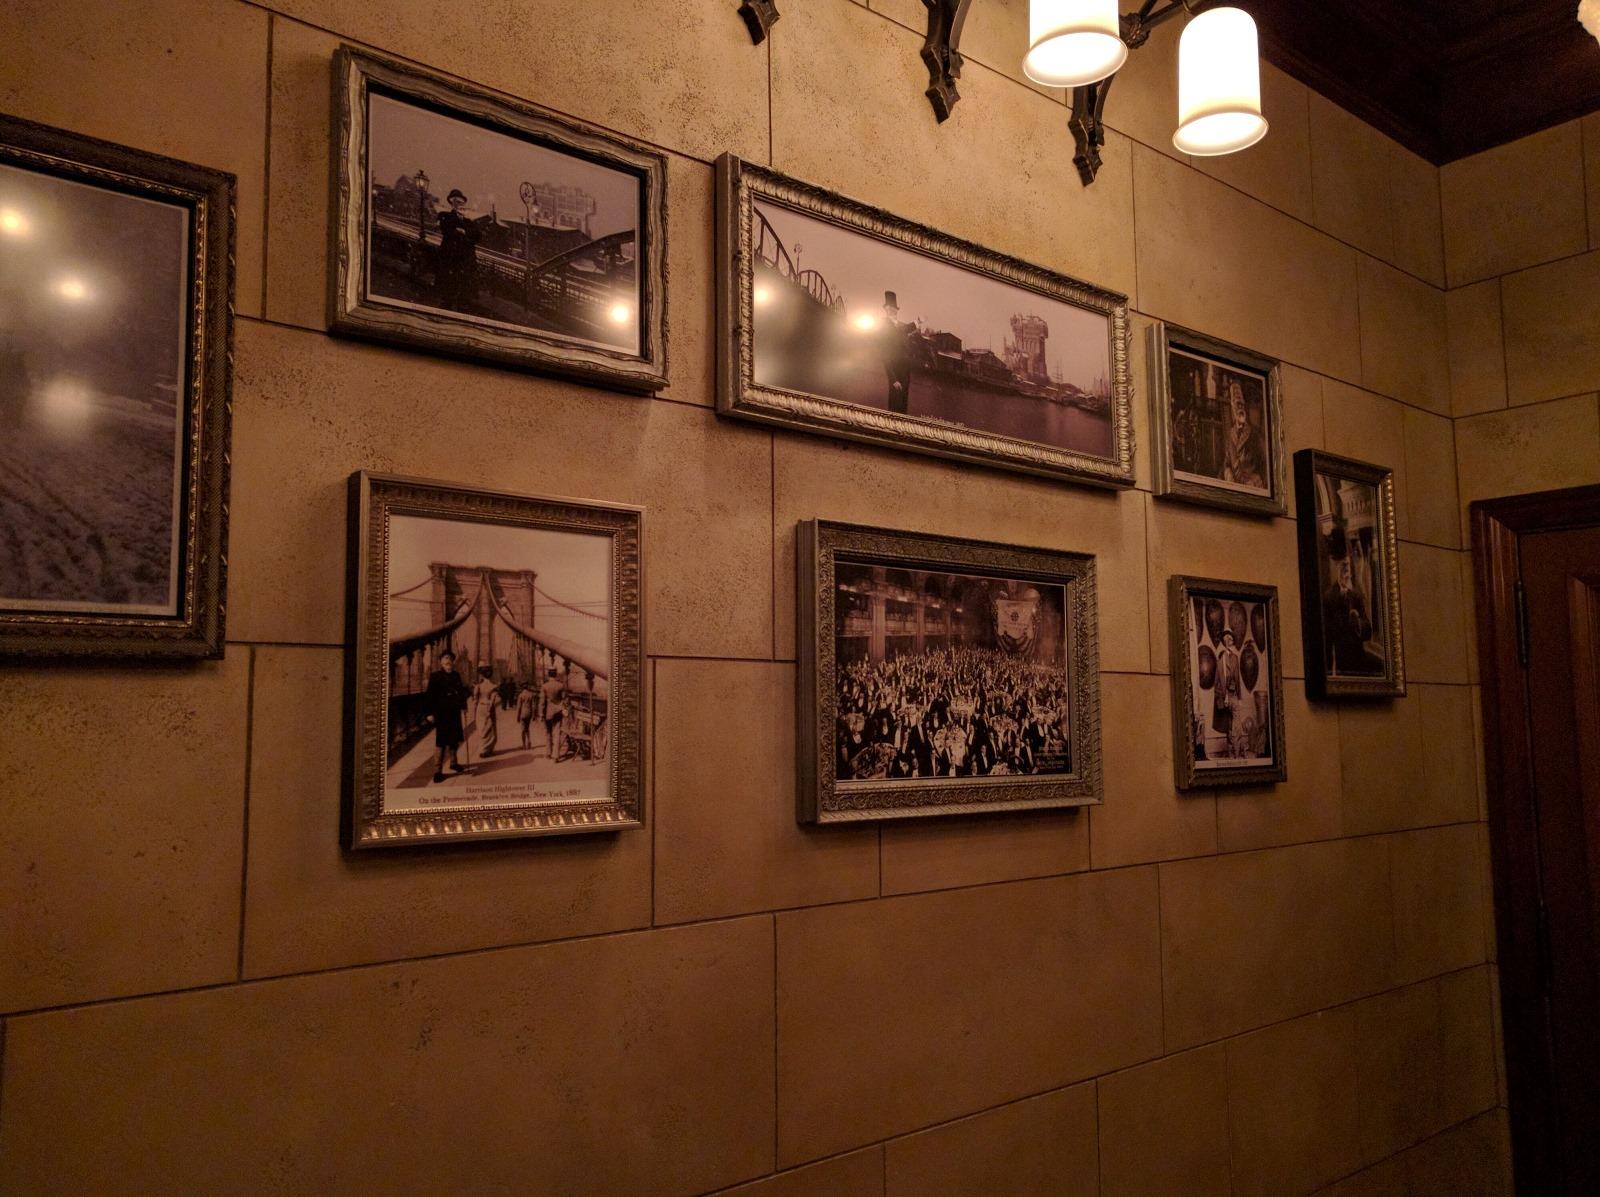 Tokyo Disneysea Review And Report - Part 2